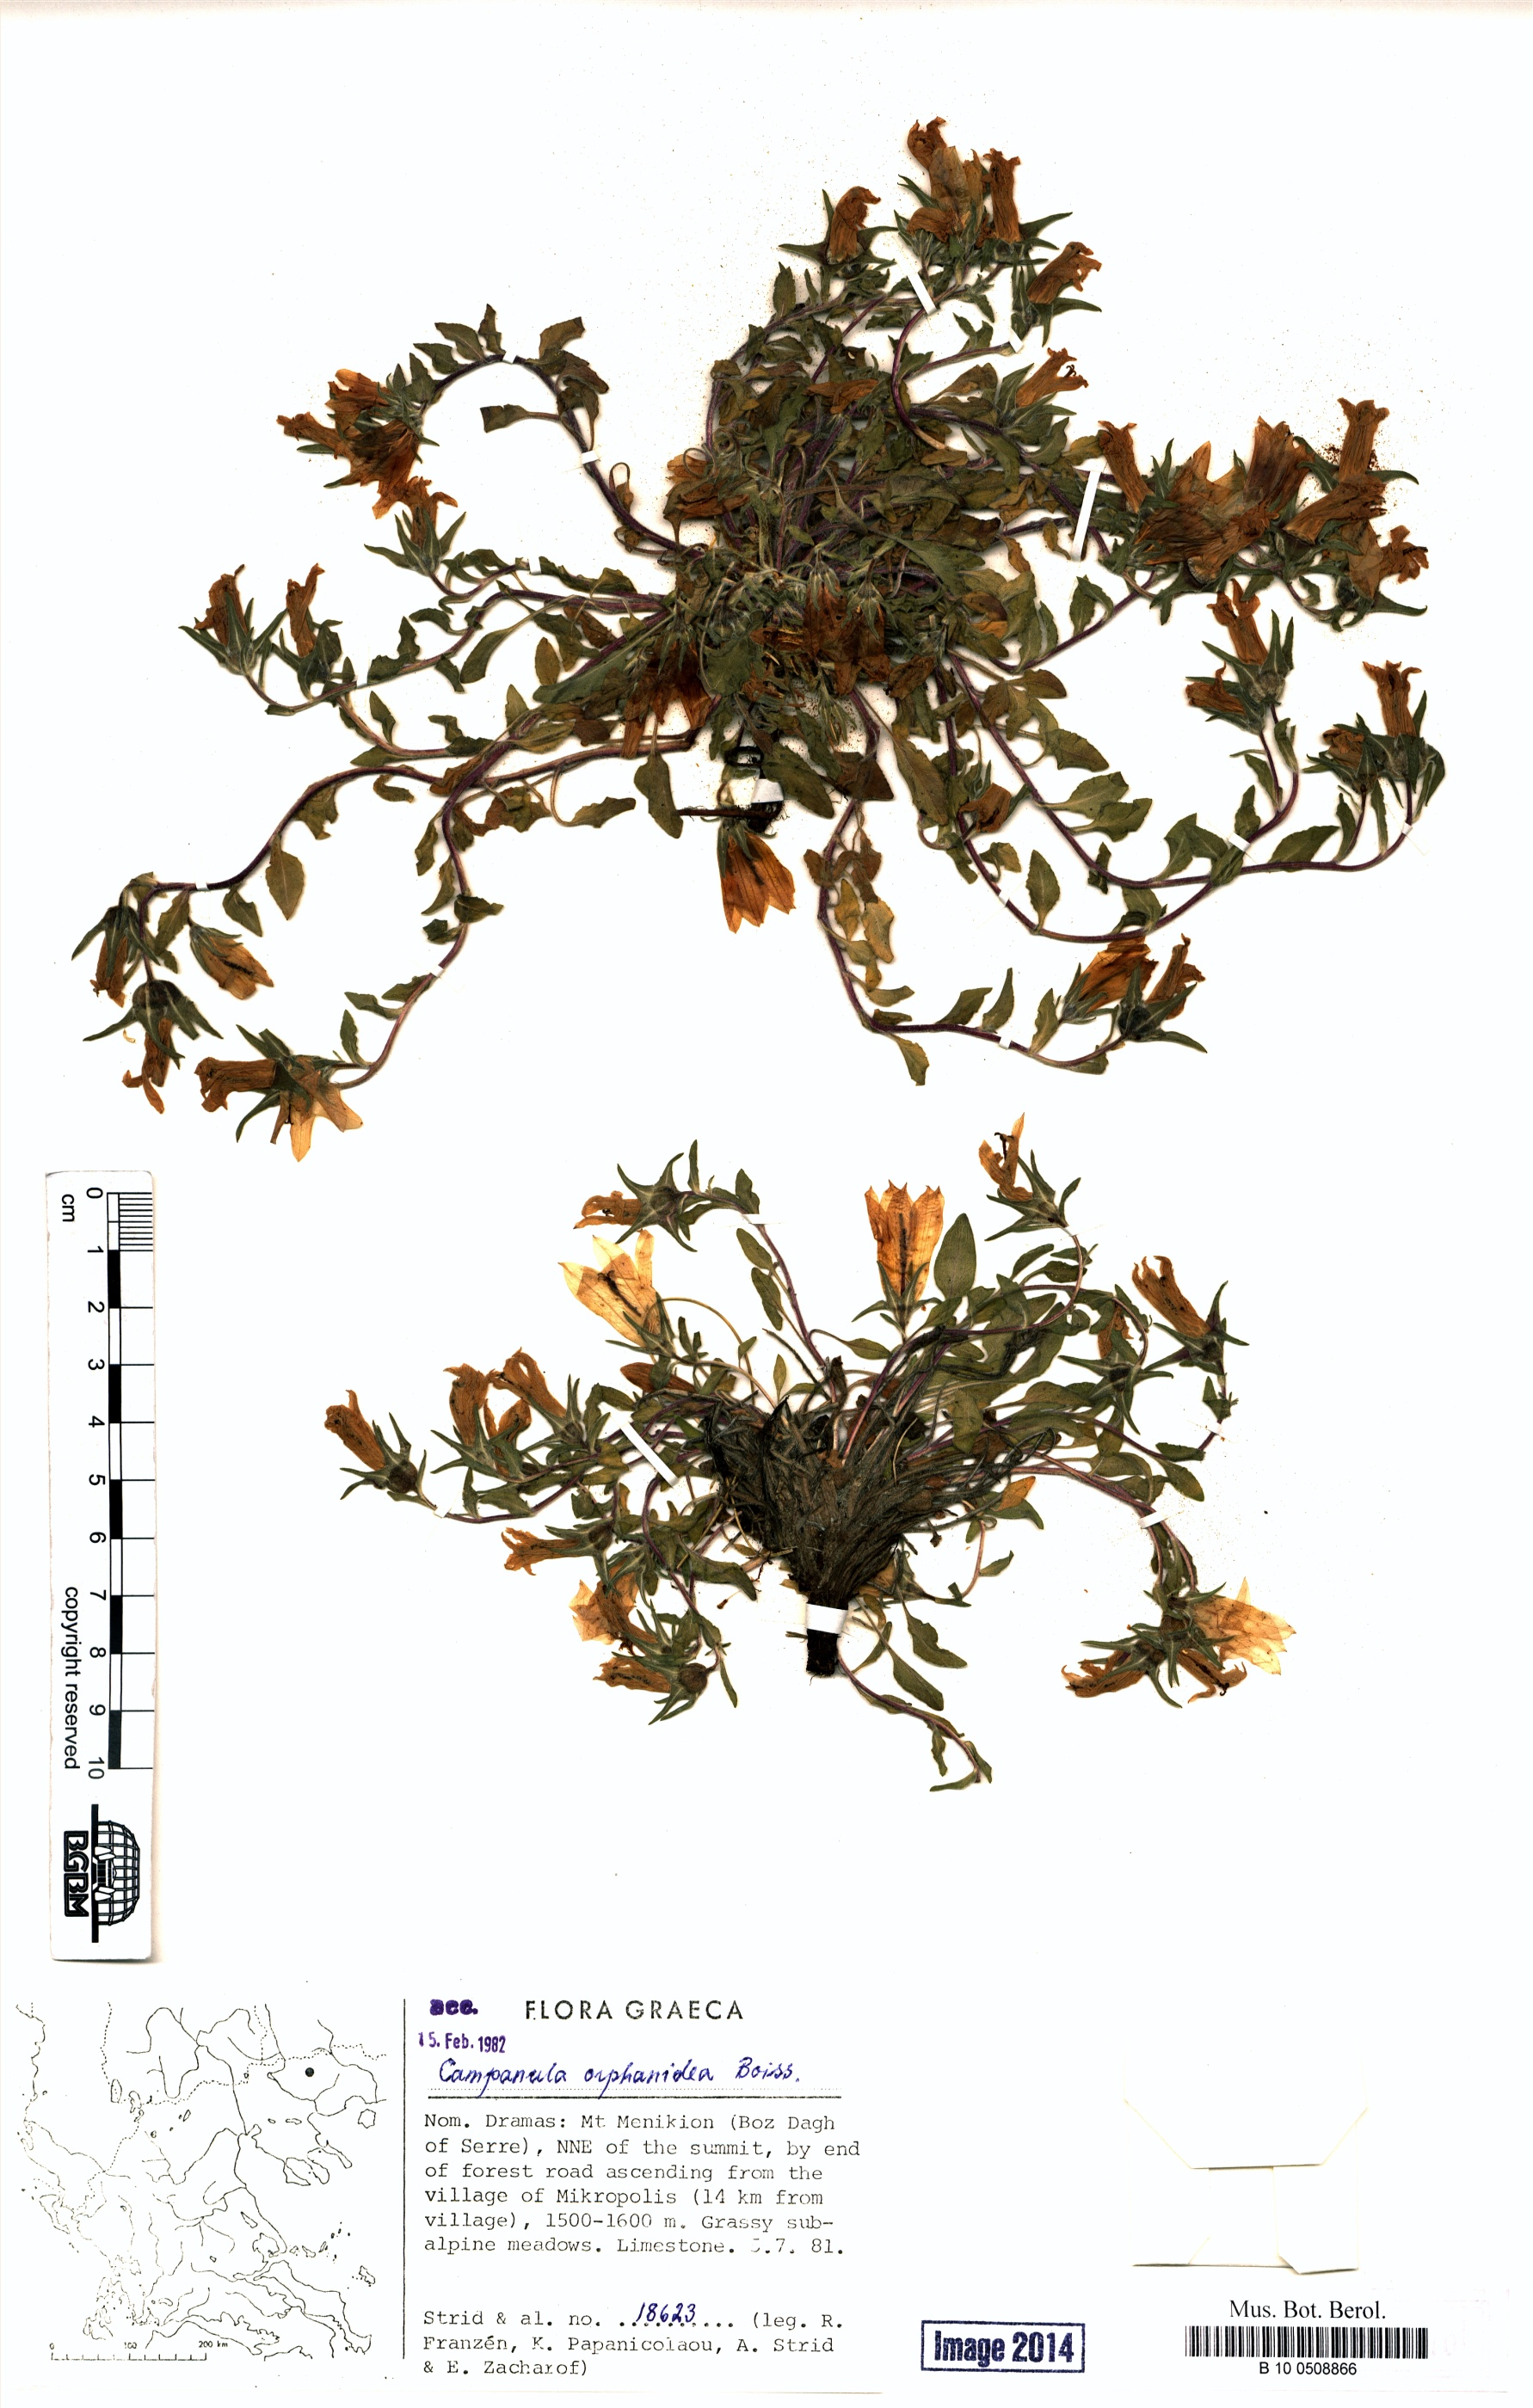 http://ww2.bgbm.org/herbarium/images/B/10/05/08/86/B_10_0508866.jpg